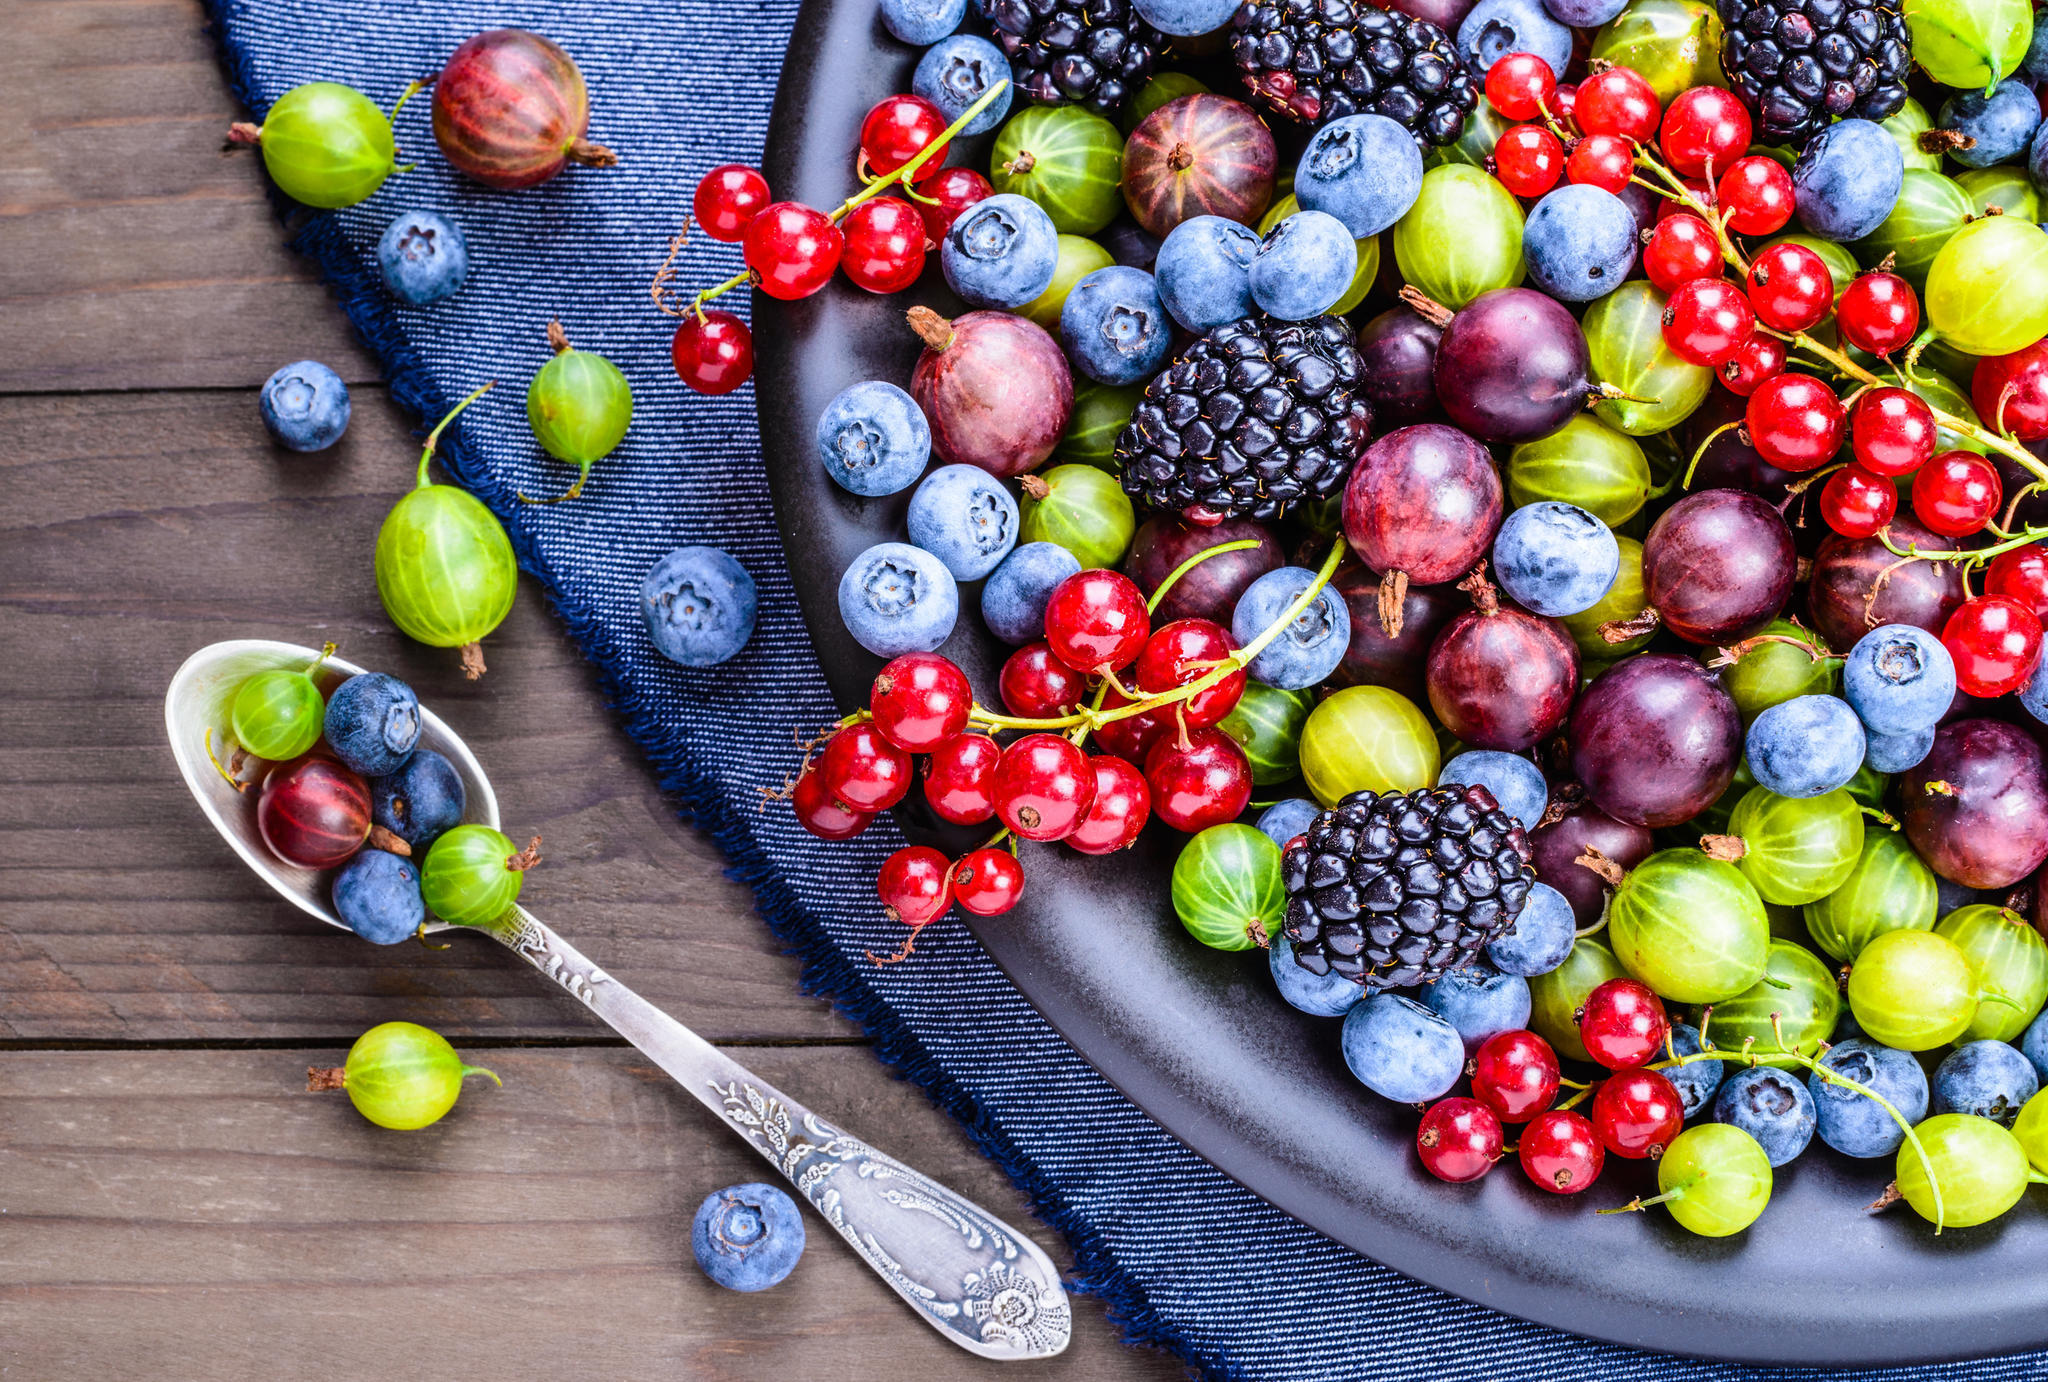 Diese 6 Lebensmittel senken deinen Blutdruck - BRIGITTE.de